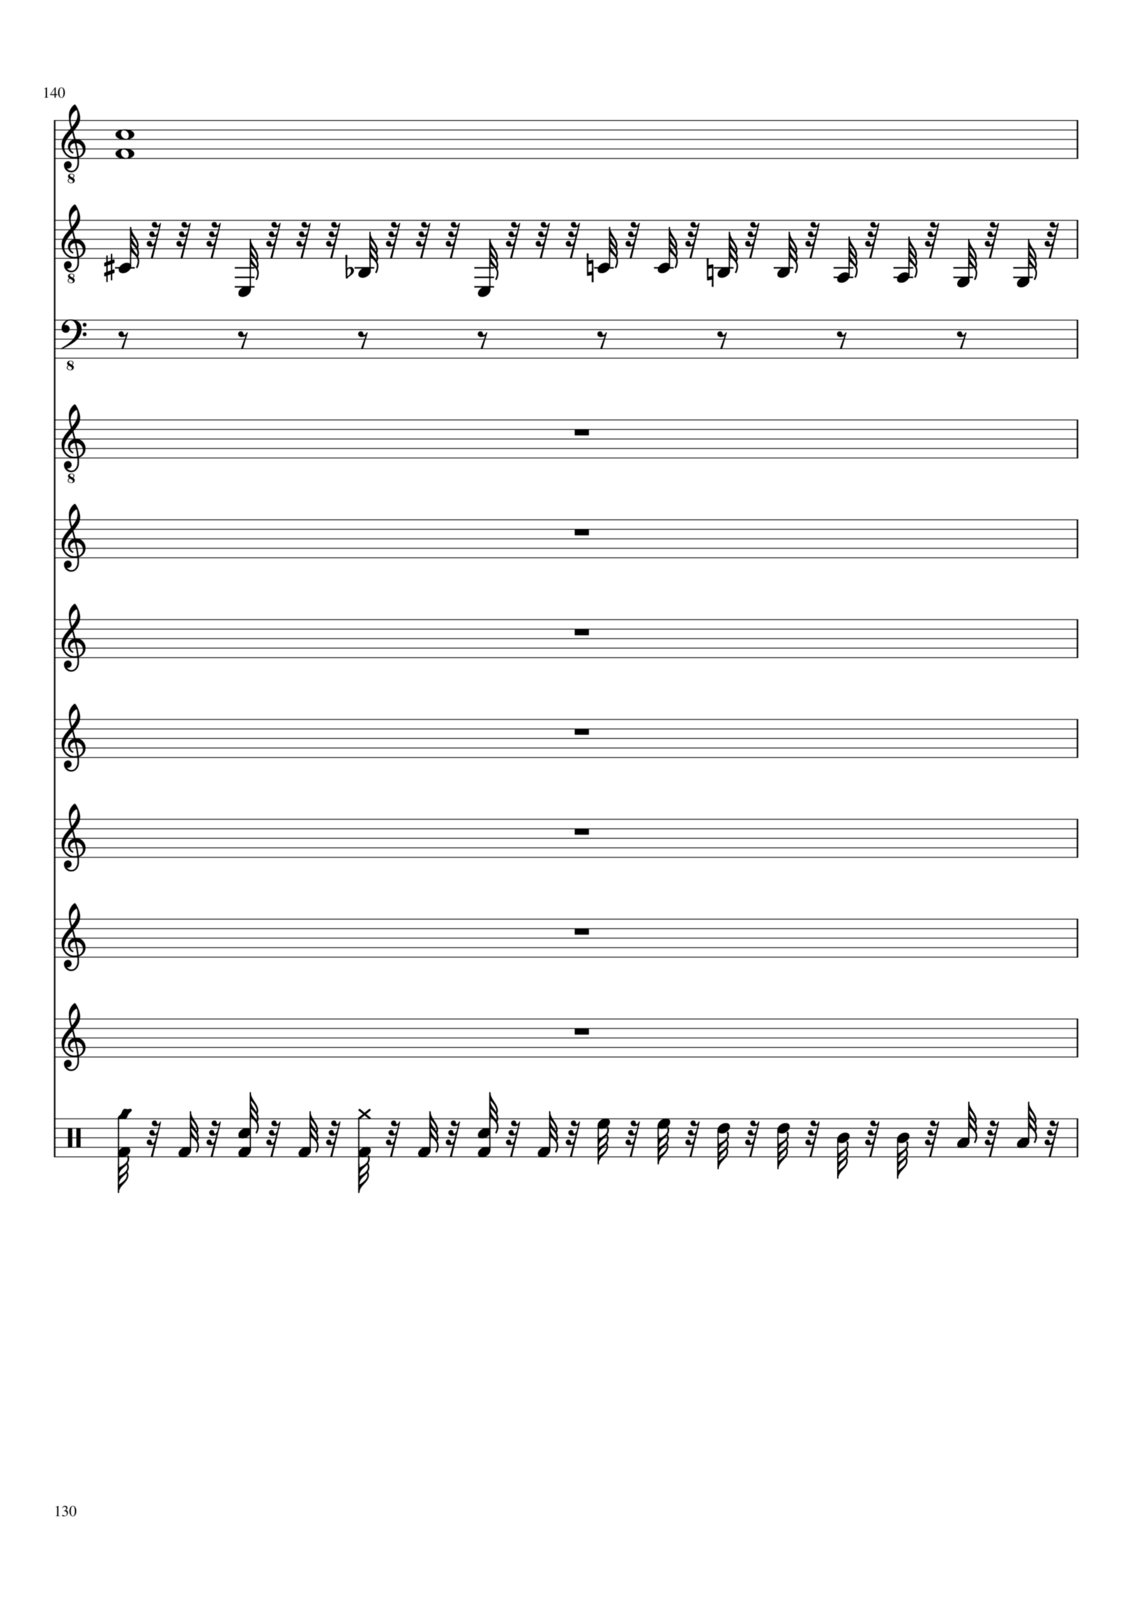 Belyiy sokol slide, Image 130